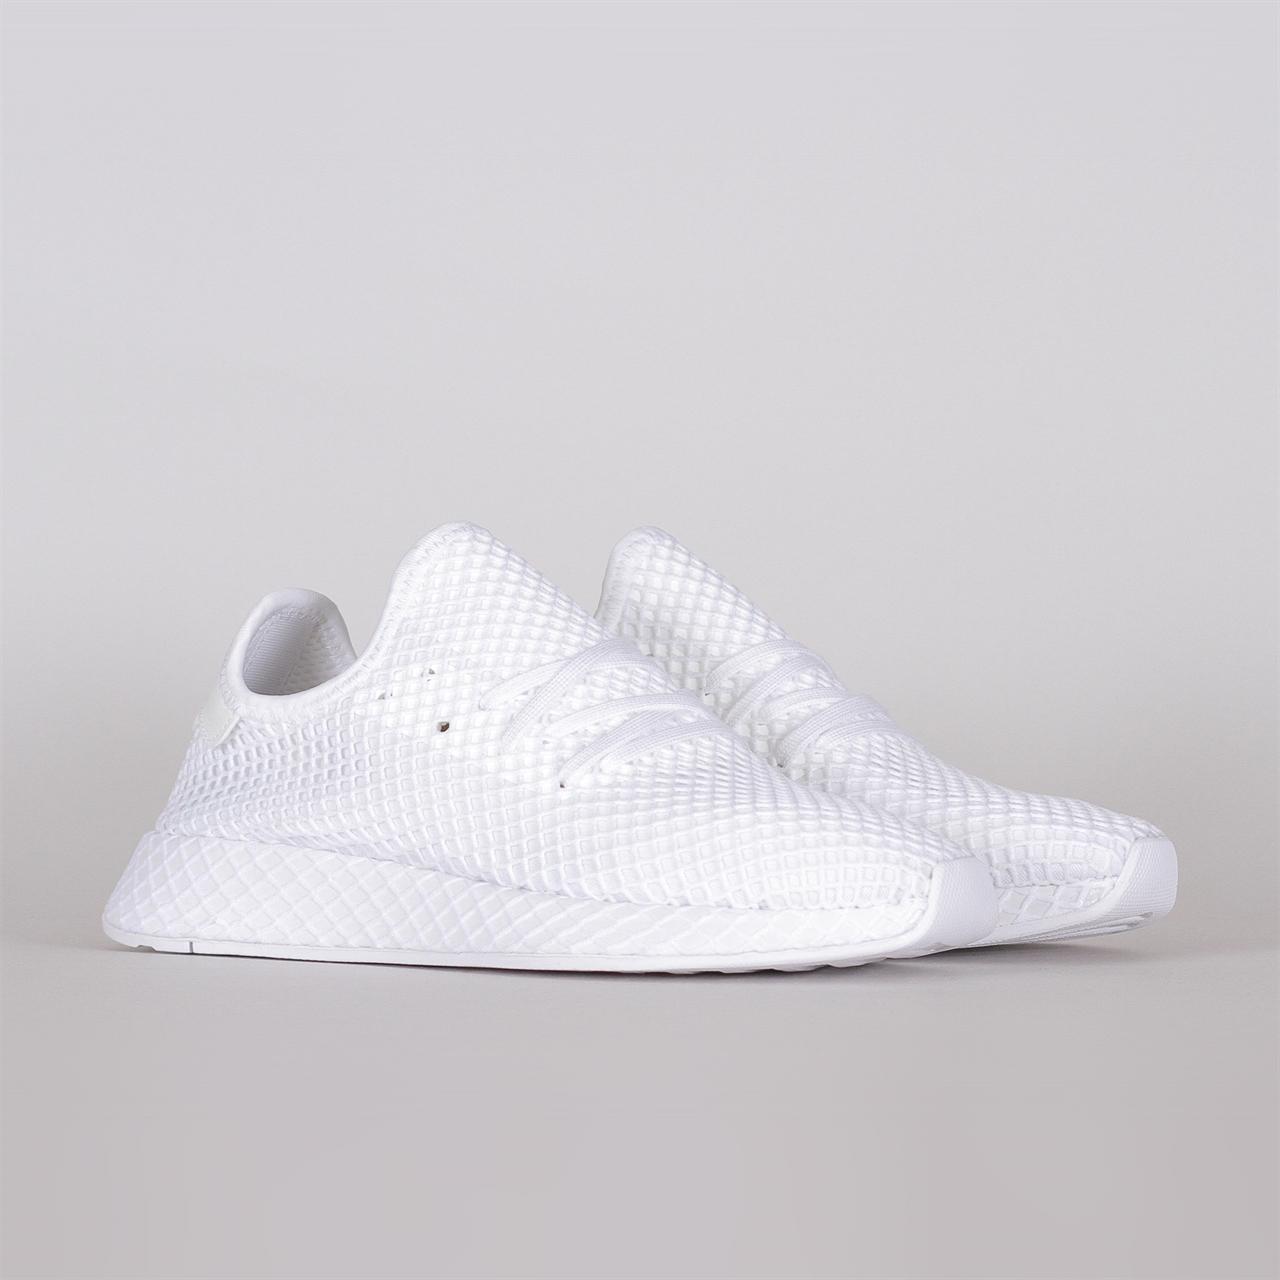 a82623f28d3ff Shelta - Adidas Originals Deerupt Runner (CQ2625)